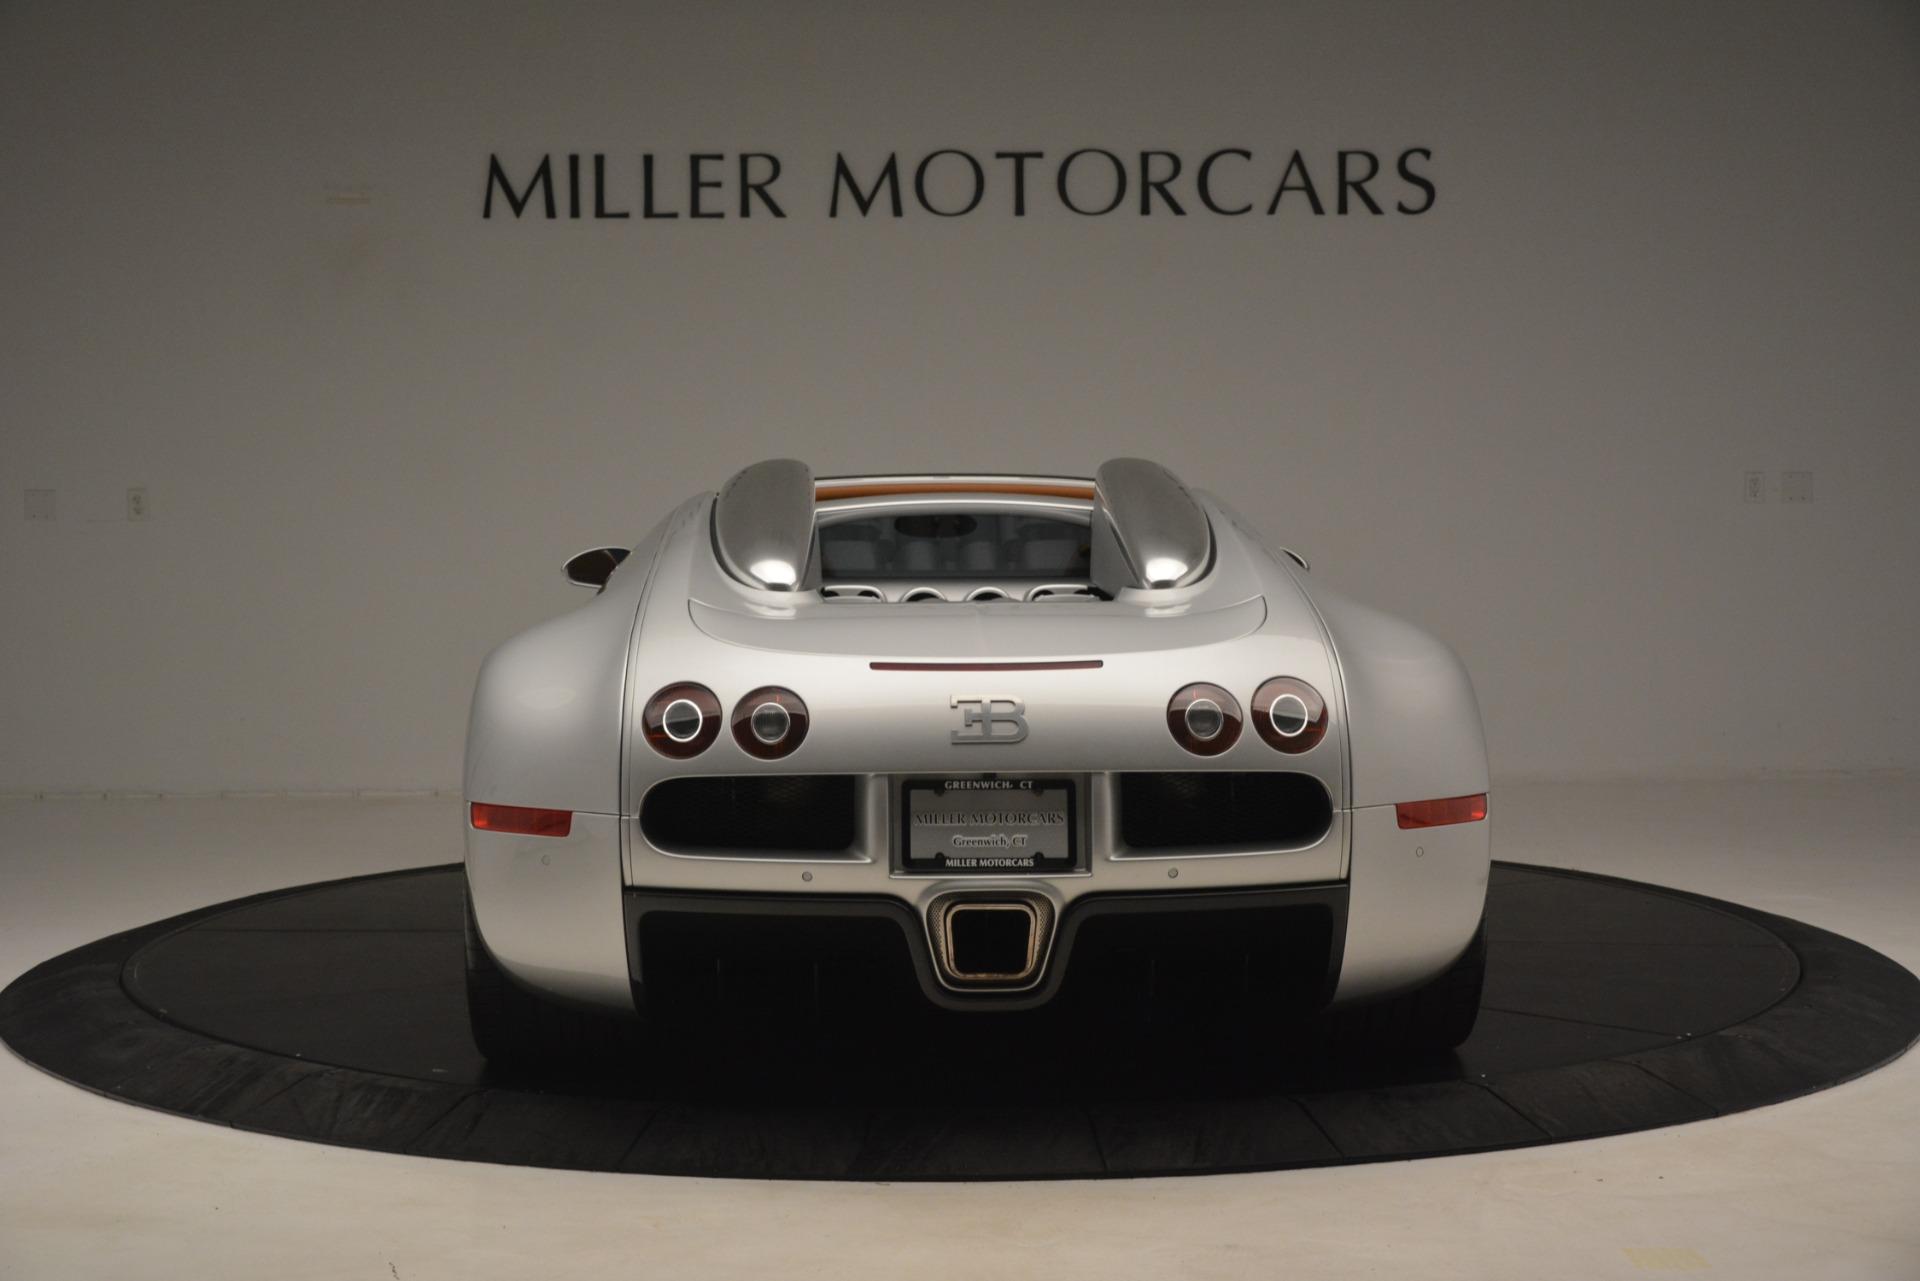 Used 2010 Bugatti Veyron 16.4 Grand Sport For Sale In Greenwich, CT 3159_p7